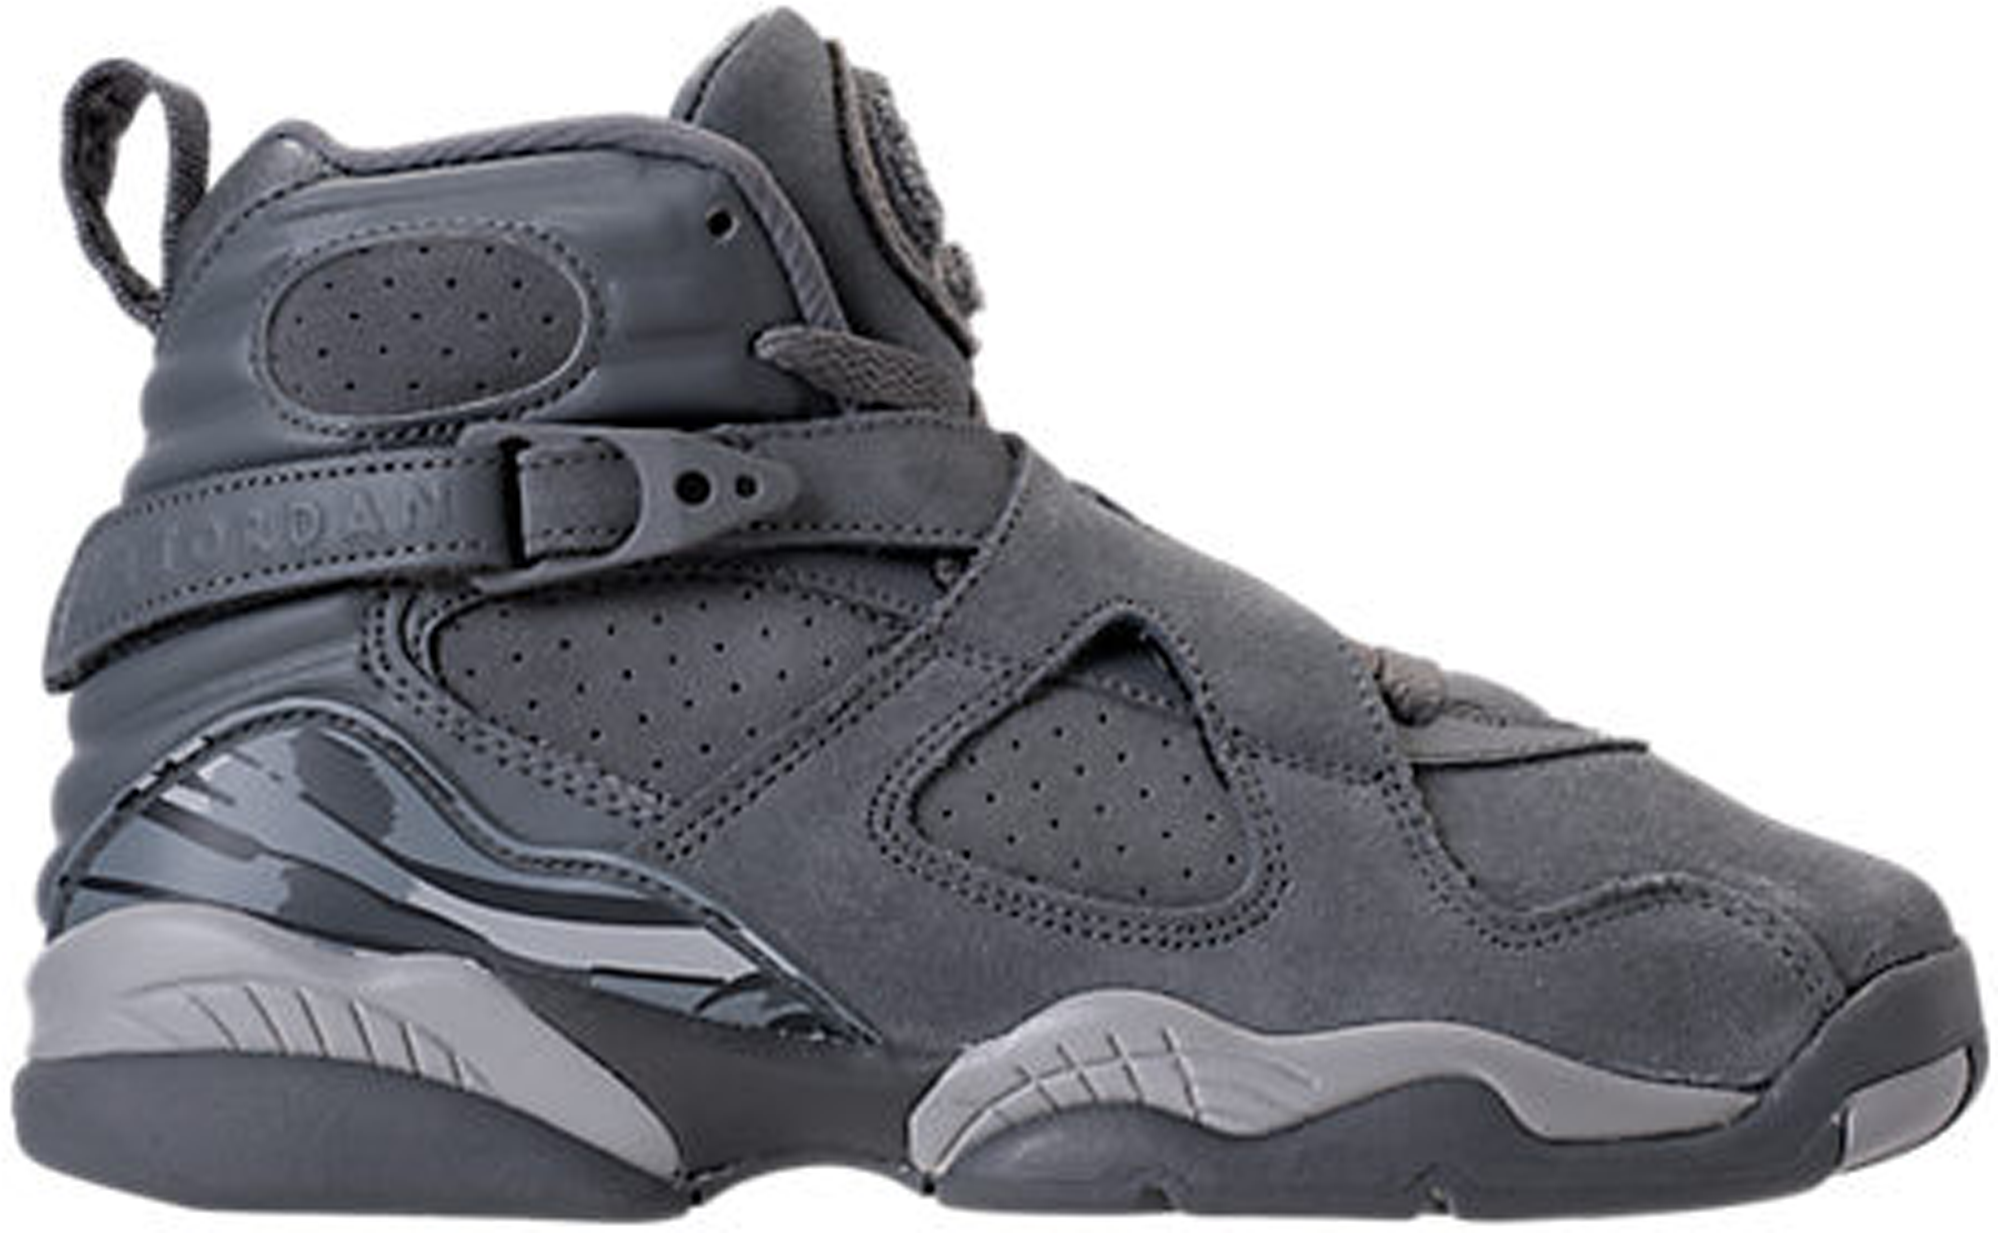 Jordan 8 Retro Cool Grey (GS)